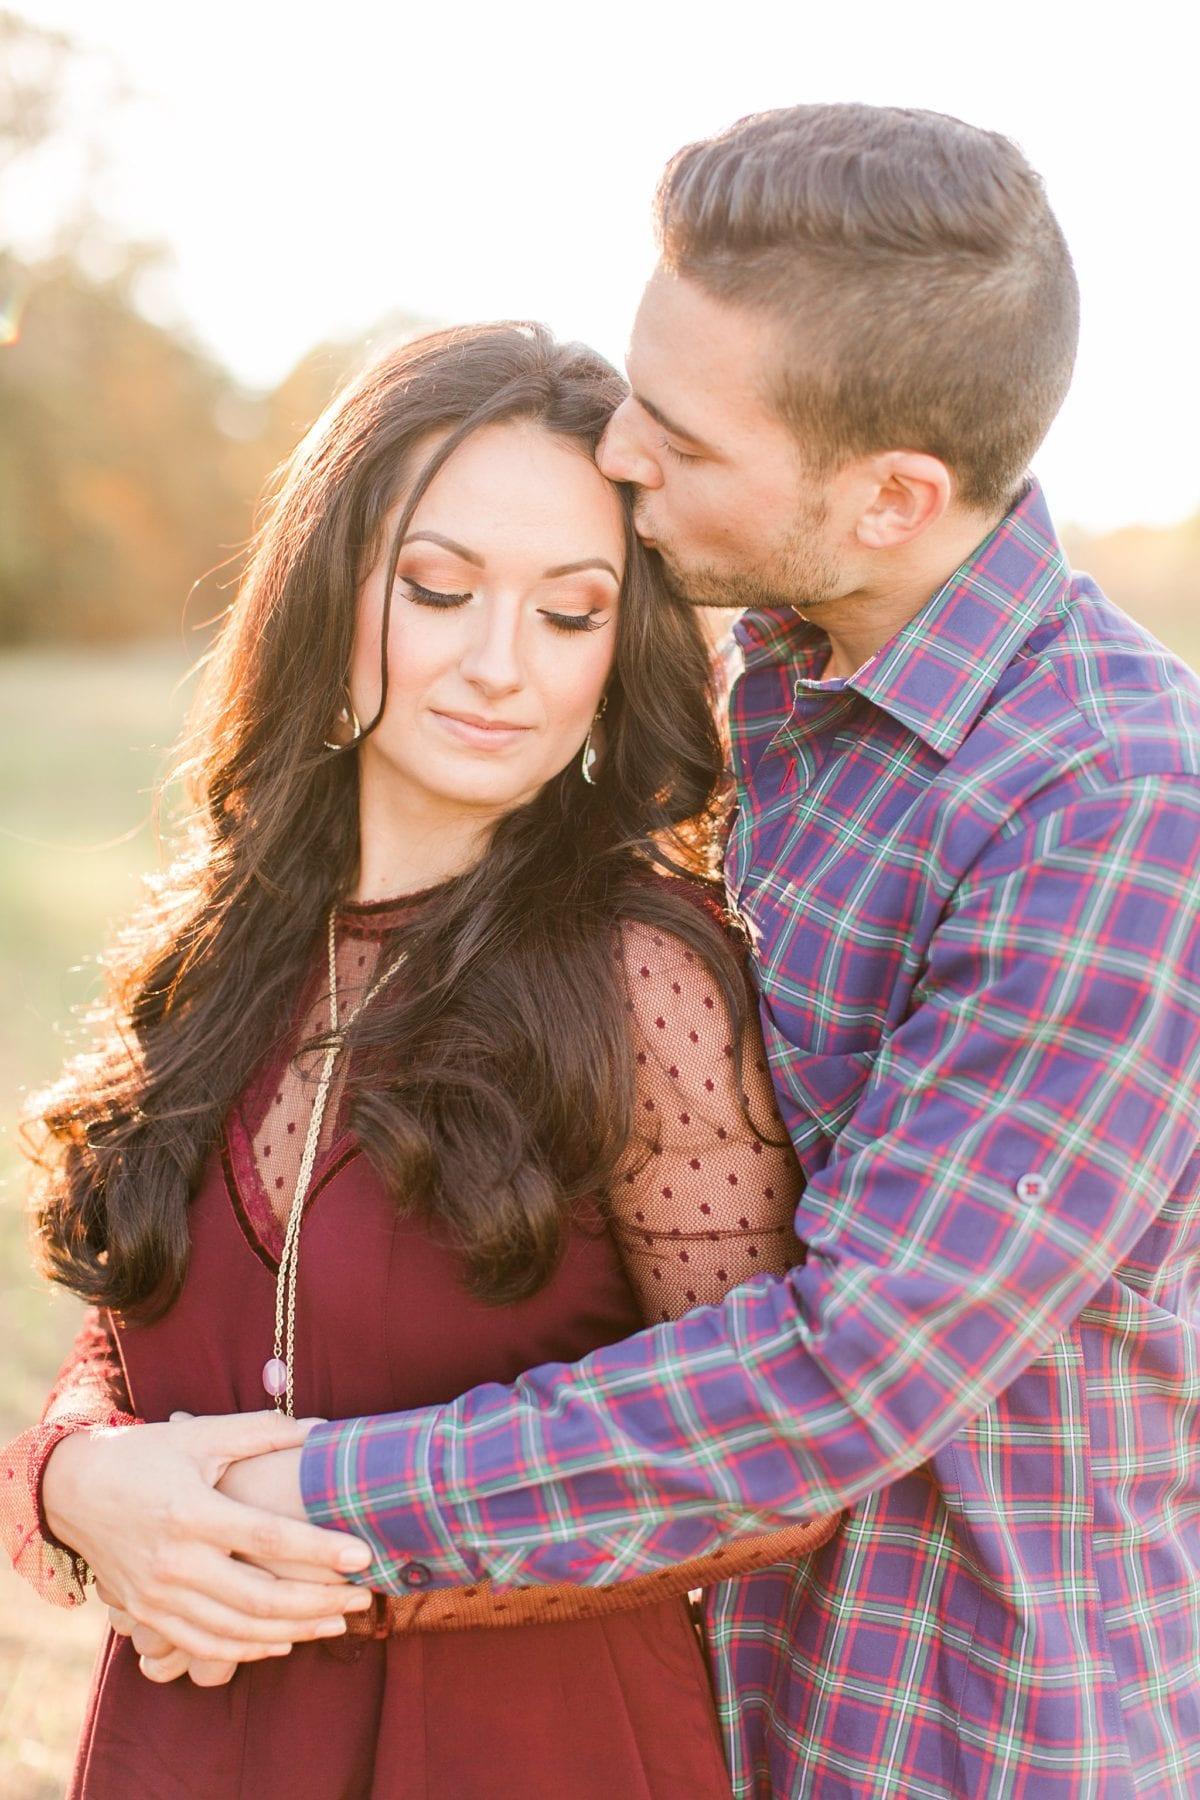 Manassas Battlefield Portraits Virginia Wedding Photographer Megan Kelsey Photography Lianne & Chris-75.jpg